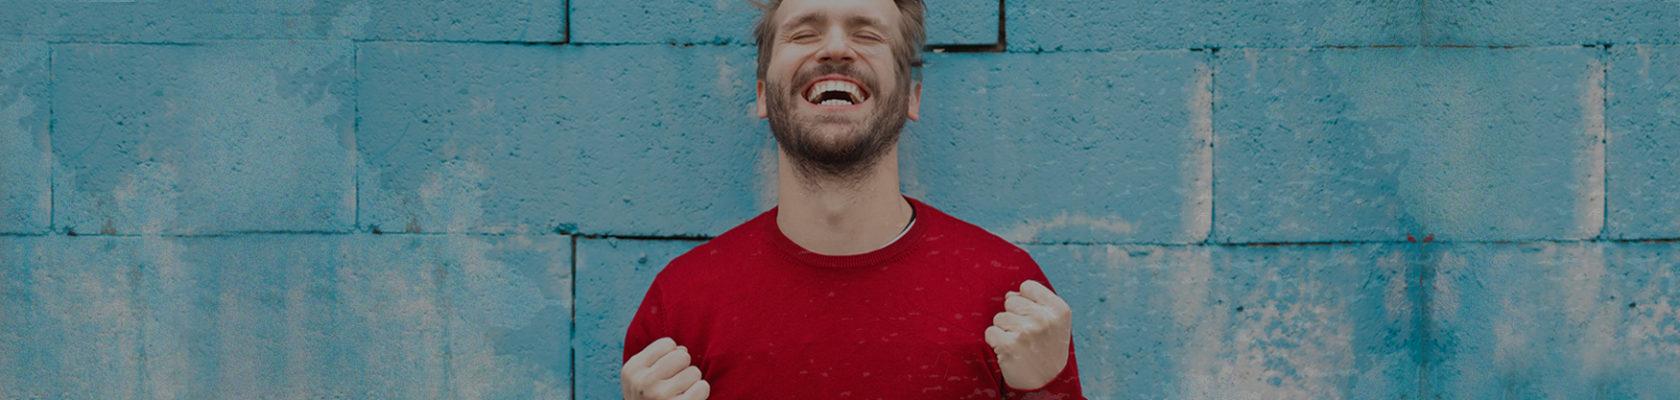 Feeling good feels so good! Try these 2 tricks.